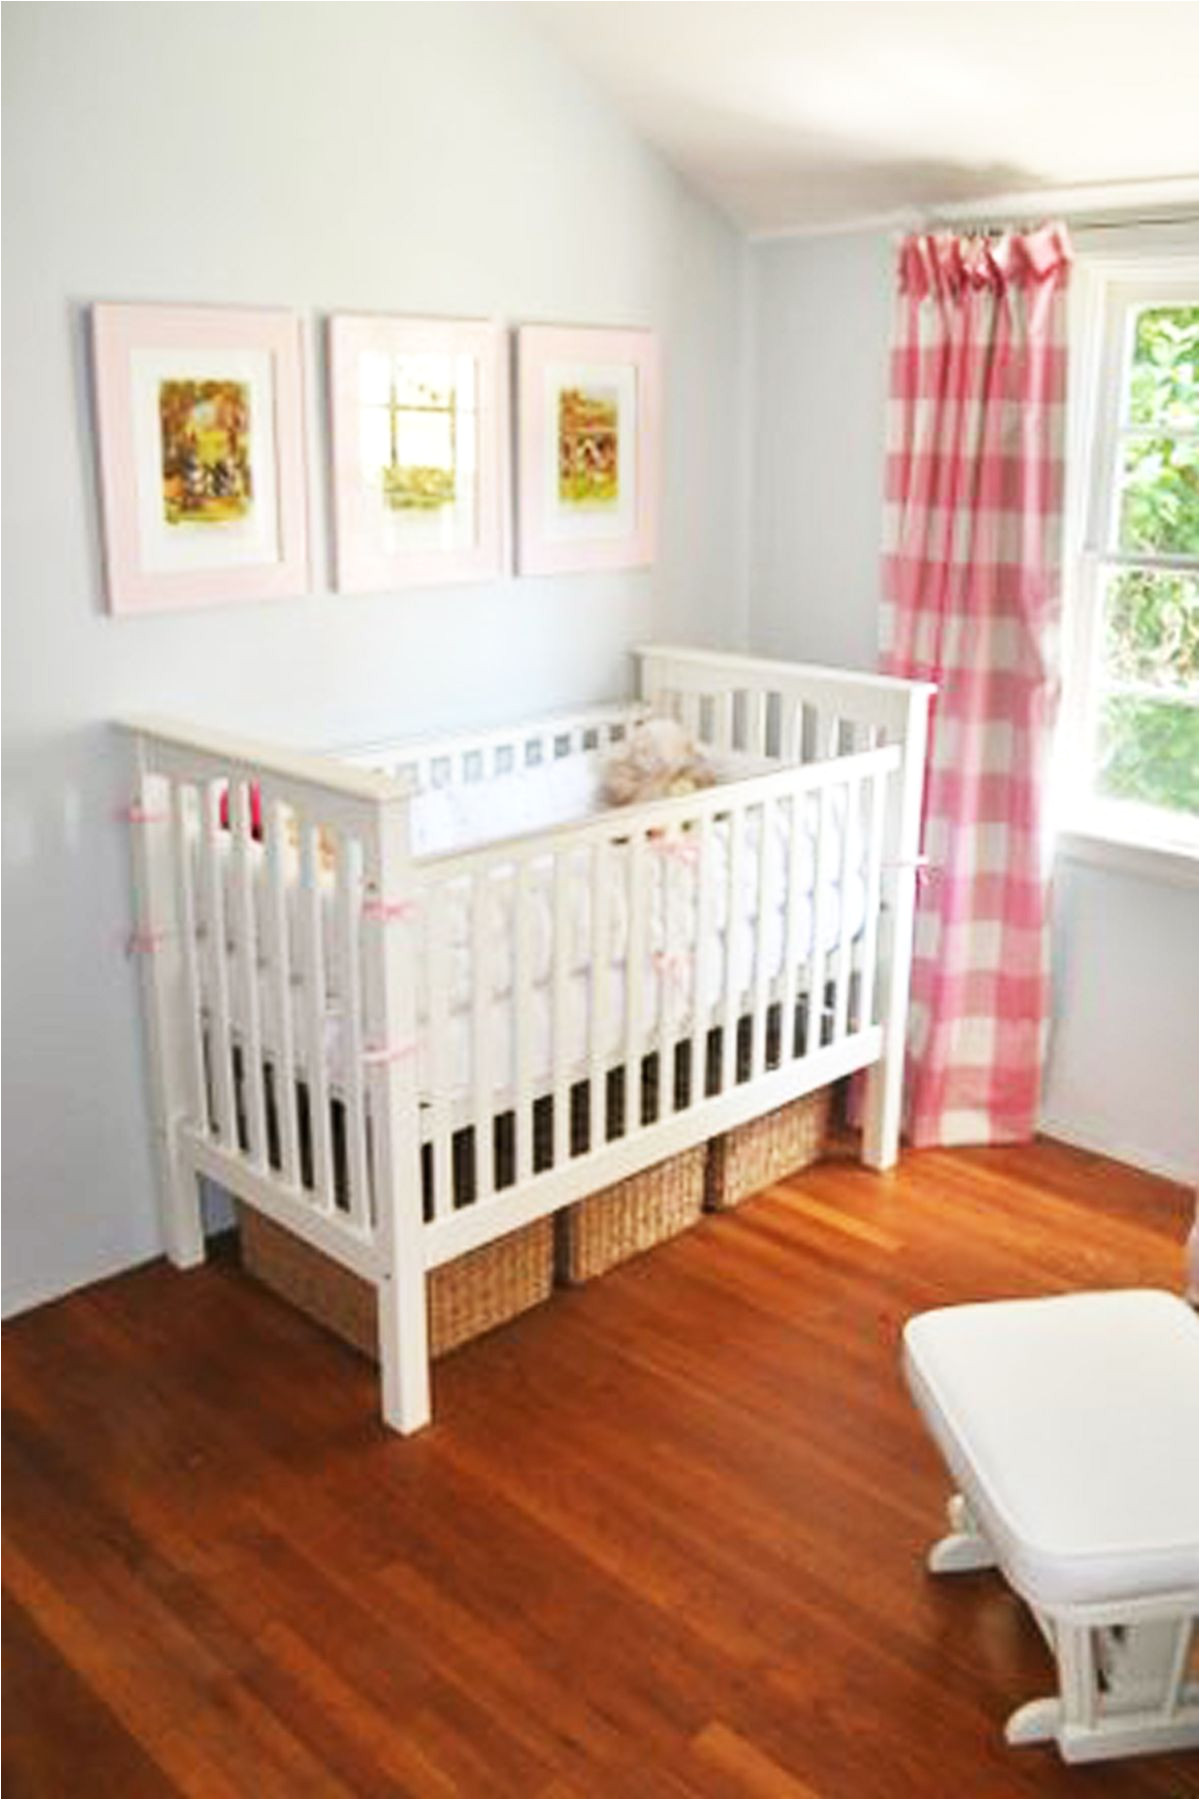 Crib With Storage Drawer Underneath Adinaporter